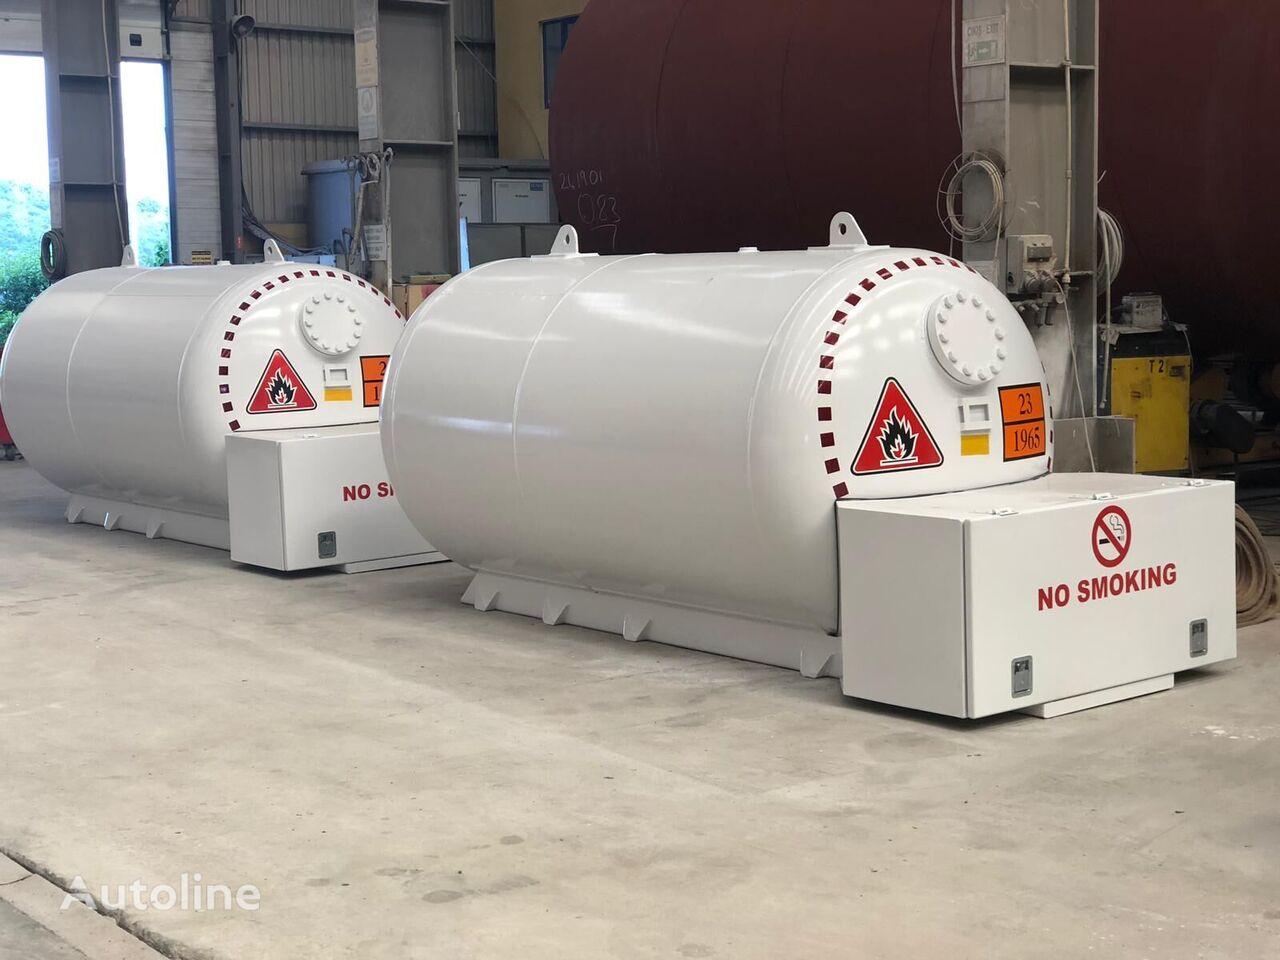 новая газовая цистерна MICANSAN bobtaıl tank 4-8-10 m3 for domestıc usıng